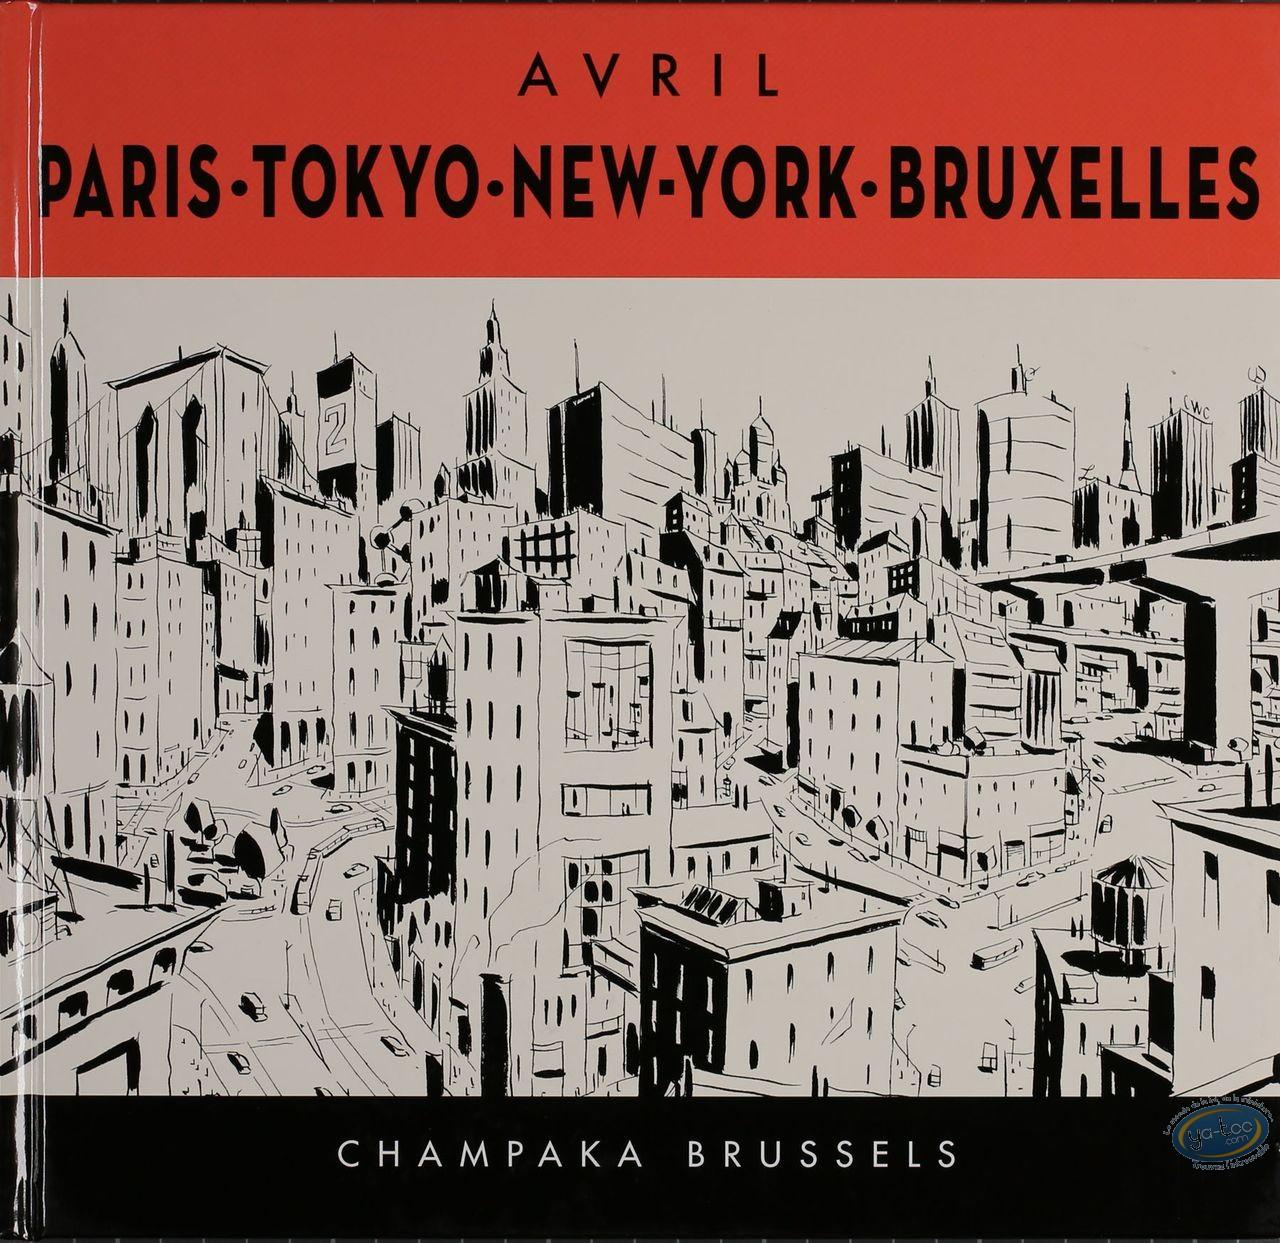 Album, Avril : Paris - Tokyo - New York - Bruxelles